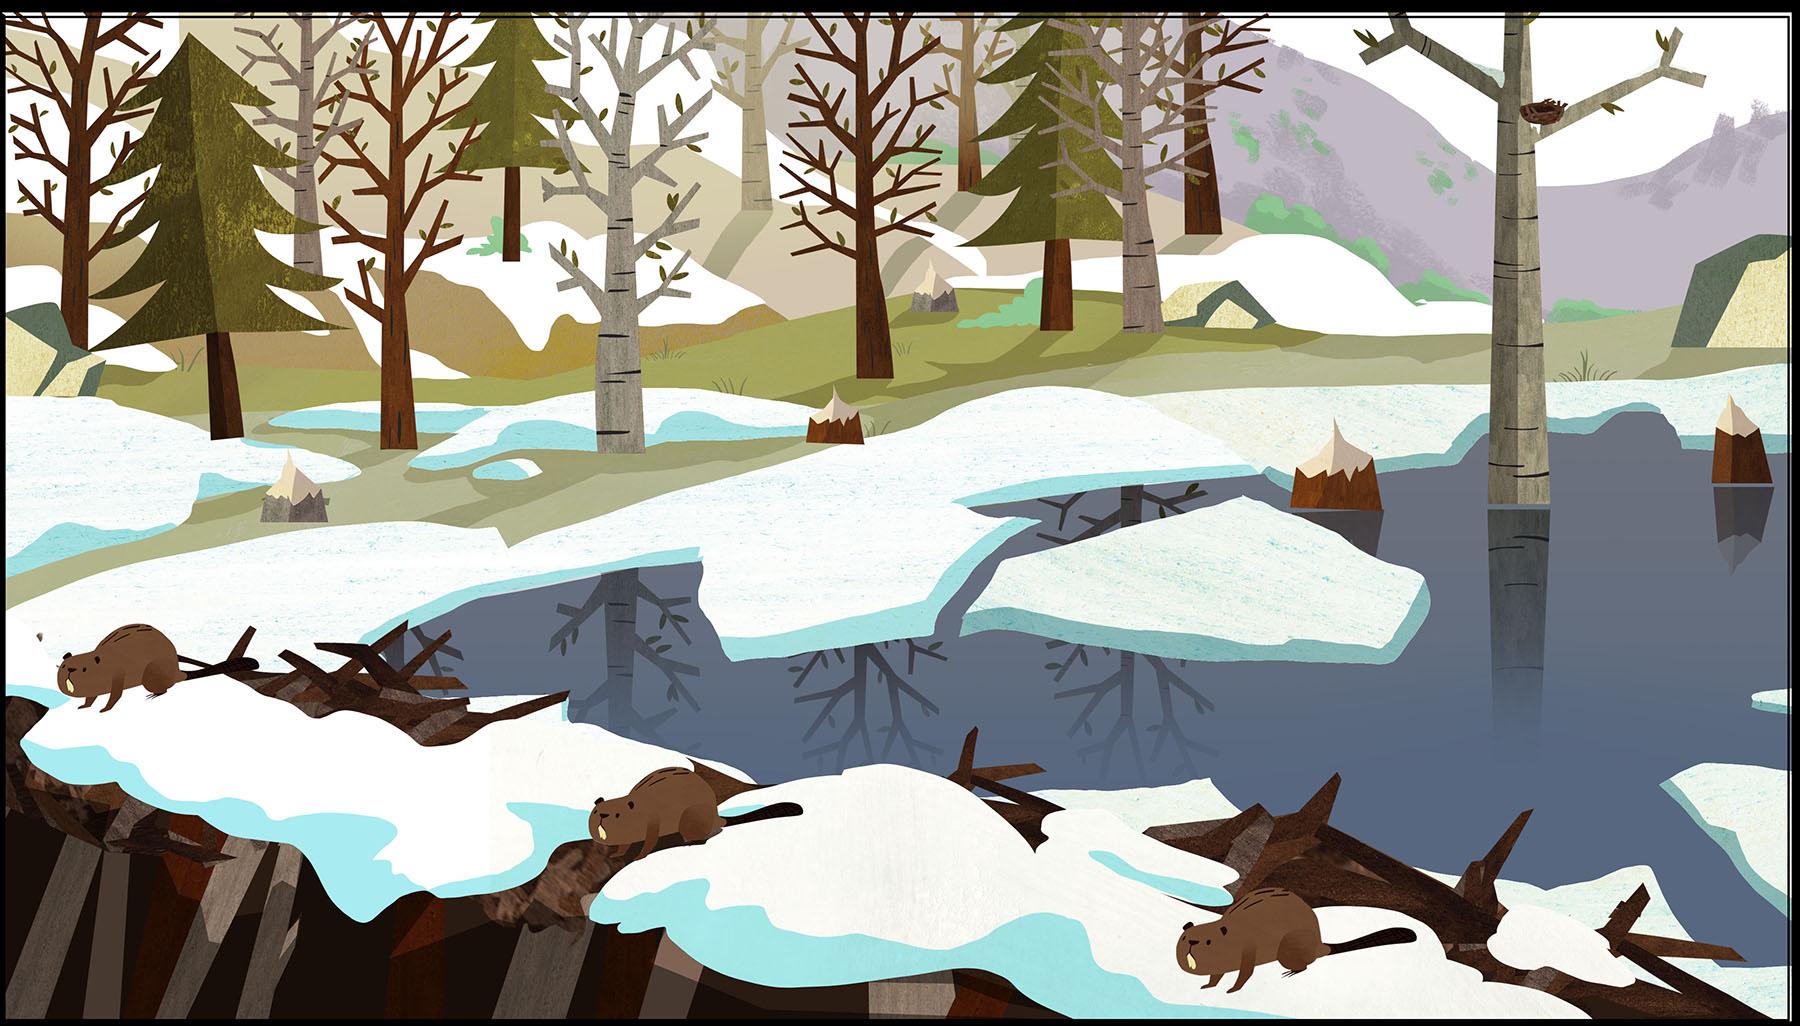 spring_beavers_sleeping_smallversion.jpg